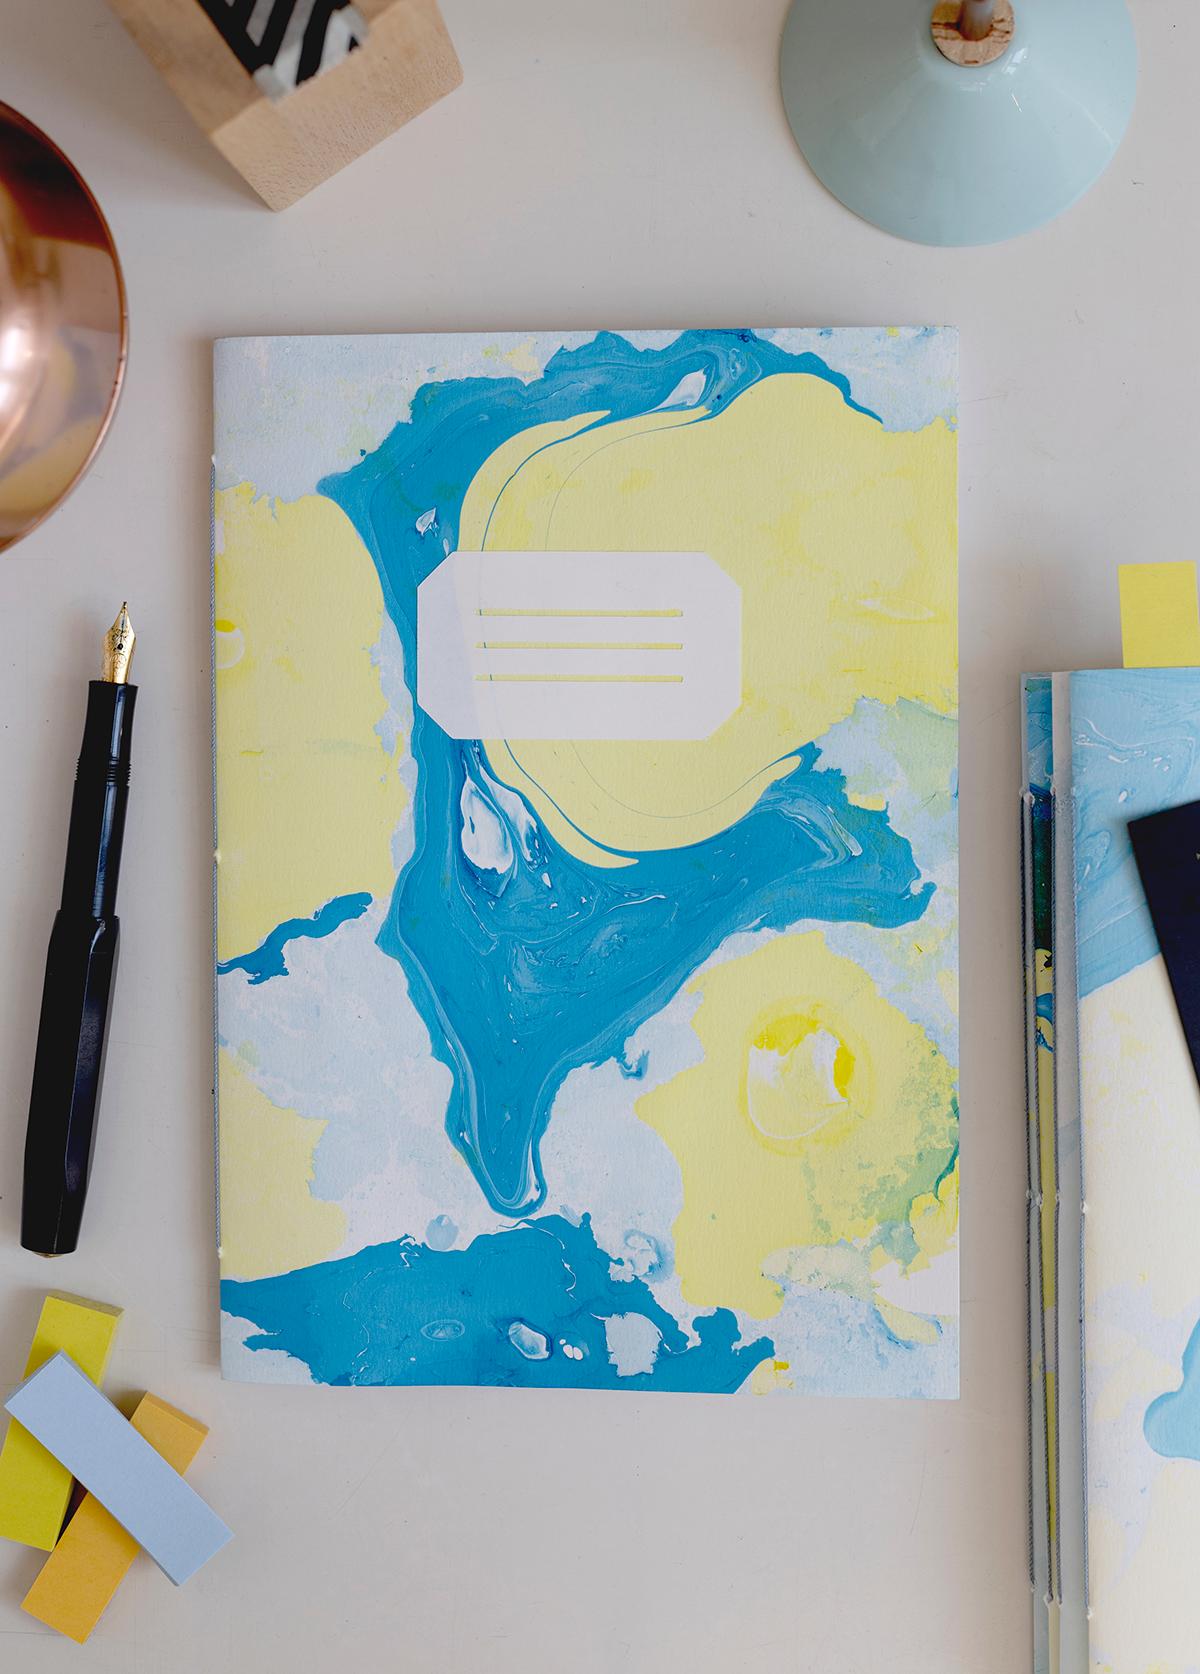 Selber machen: Papier marmorieren - DIY-Anleitung | we love handmade